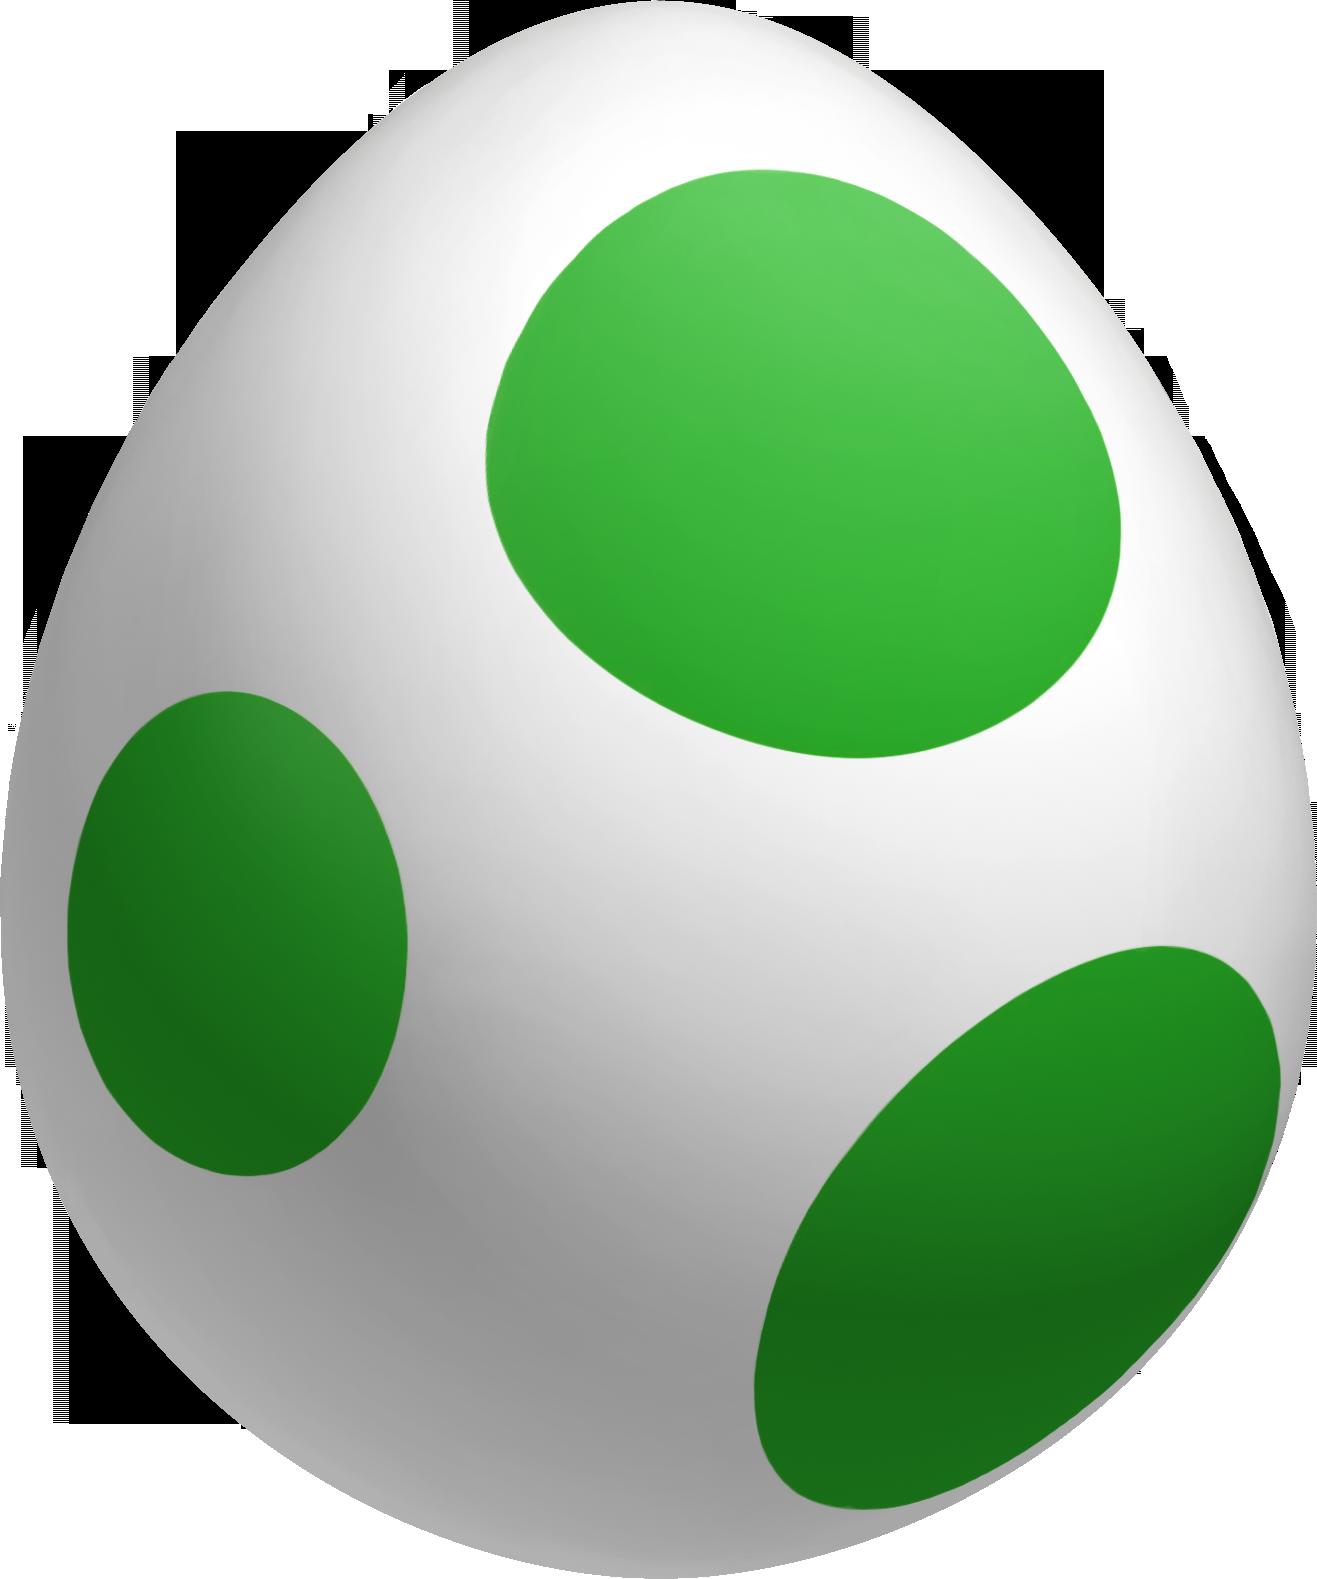 Green B Logo Template photo - 1